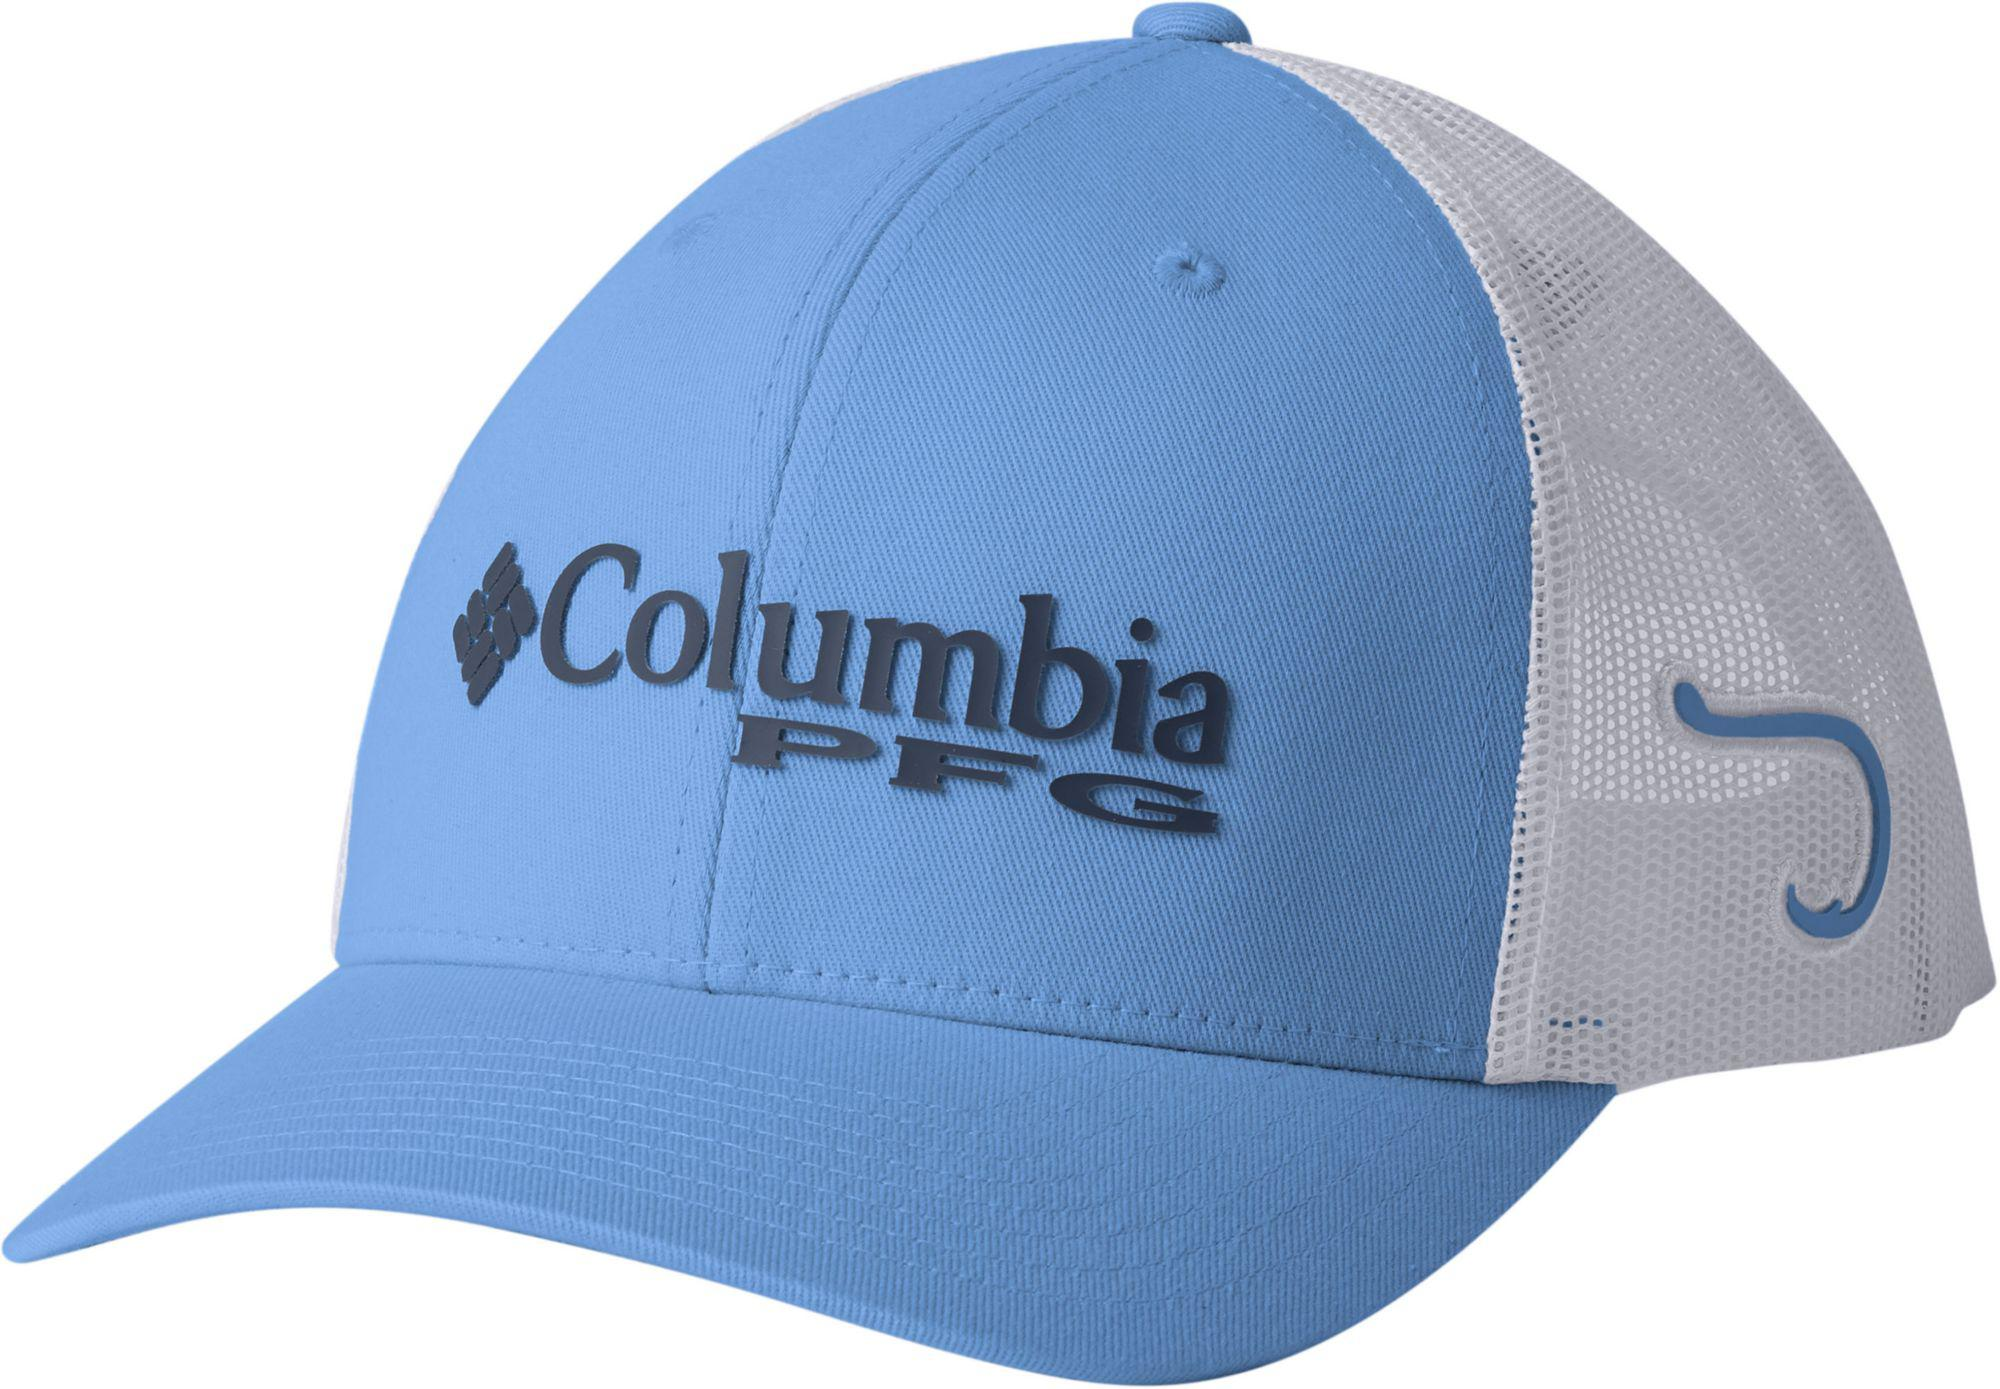 Lyst - Columbia Pfg Mesh Snap Back Cap in White for Men 04f4790b7478